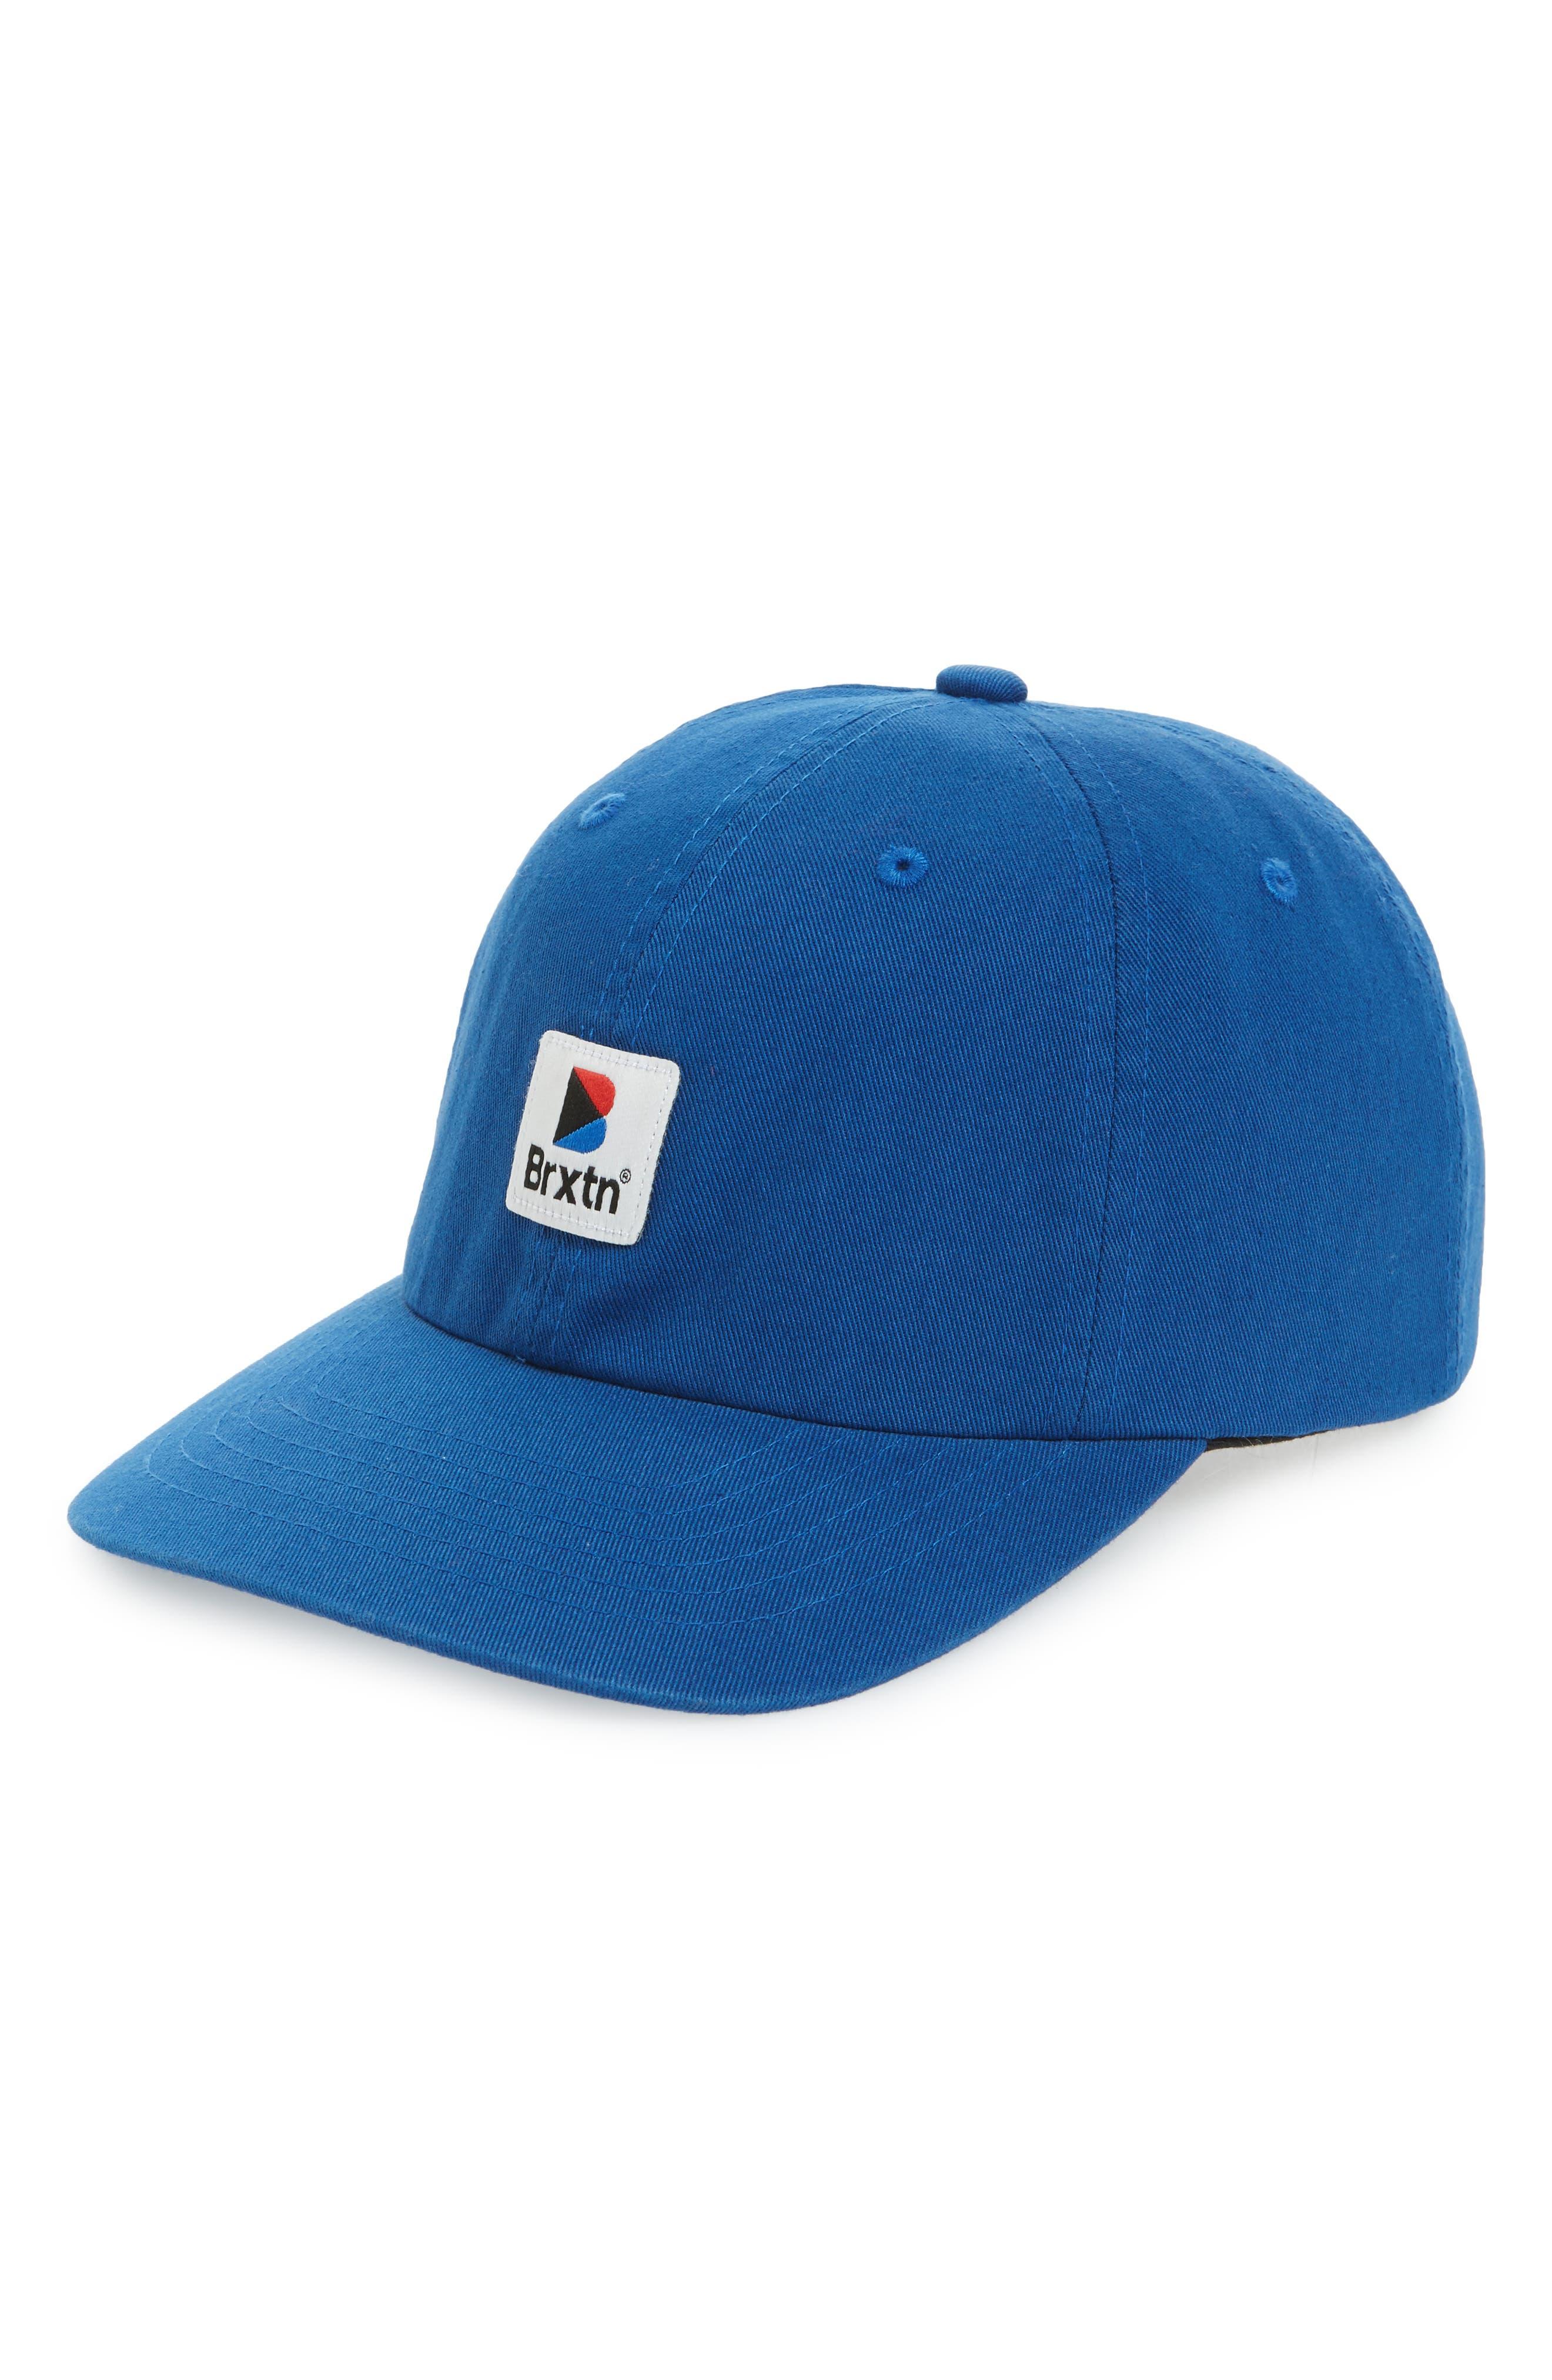 Stowell Baseball Cap,                         Main,                         color, ROYAL